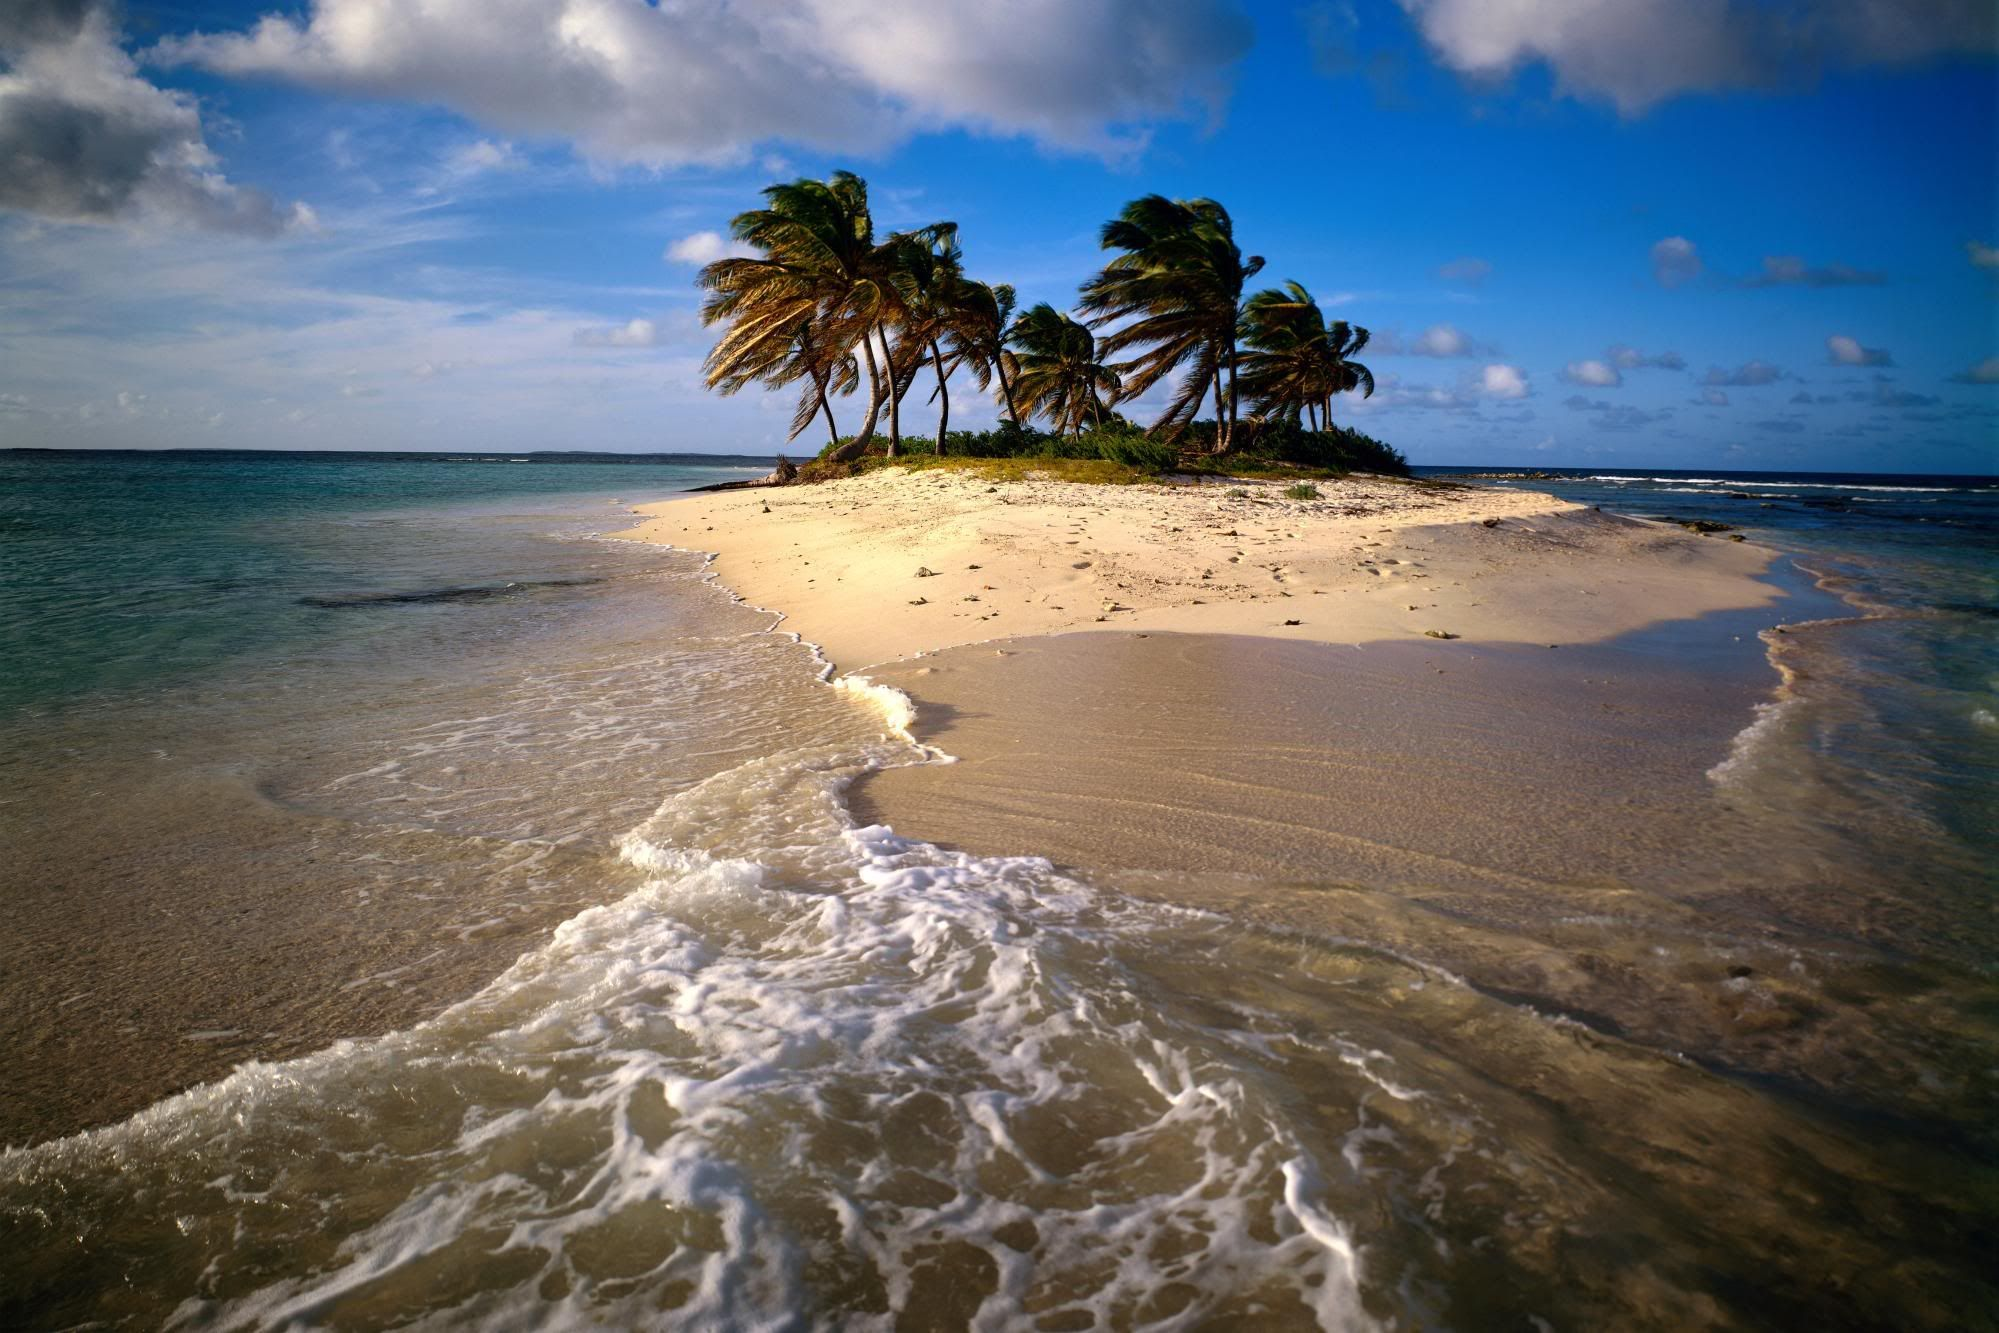 Beaches On Bimini Amazing Beach Sunset Bimini Island Bahamas Beautiful Pics Pics Island Wallpaper Caribbean Beaches Beautiful Places